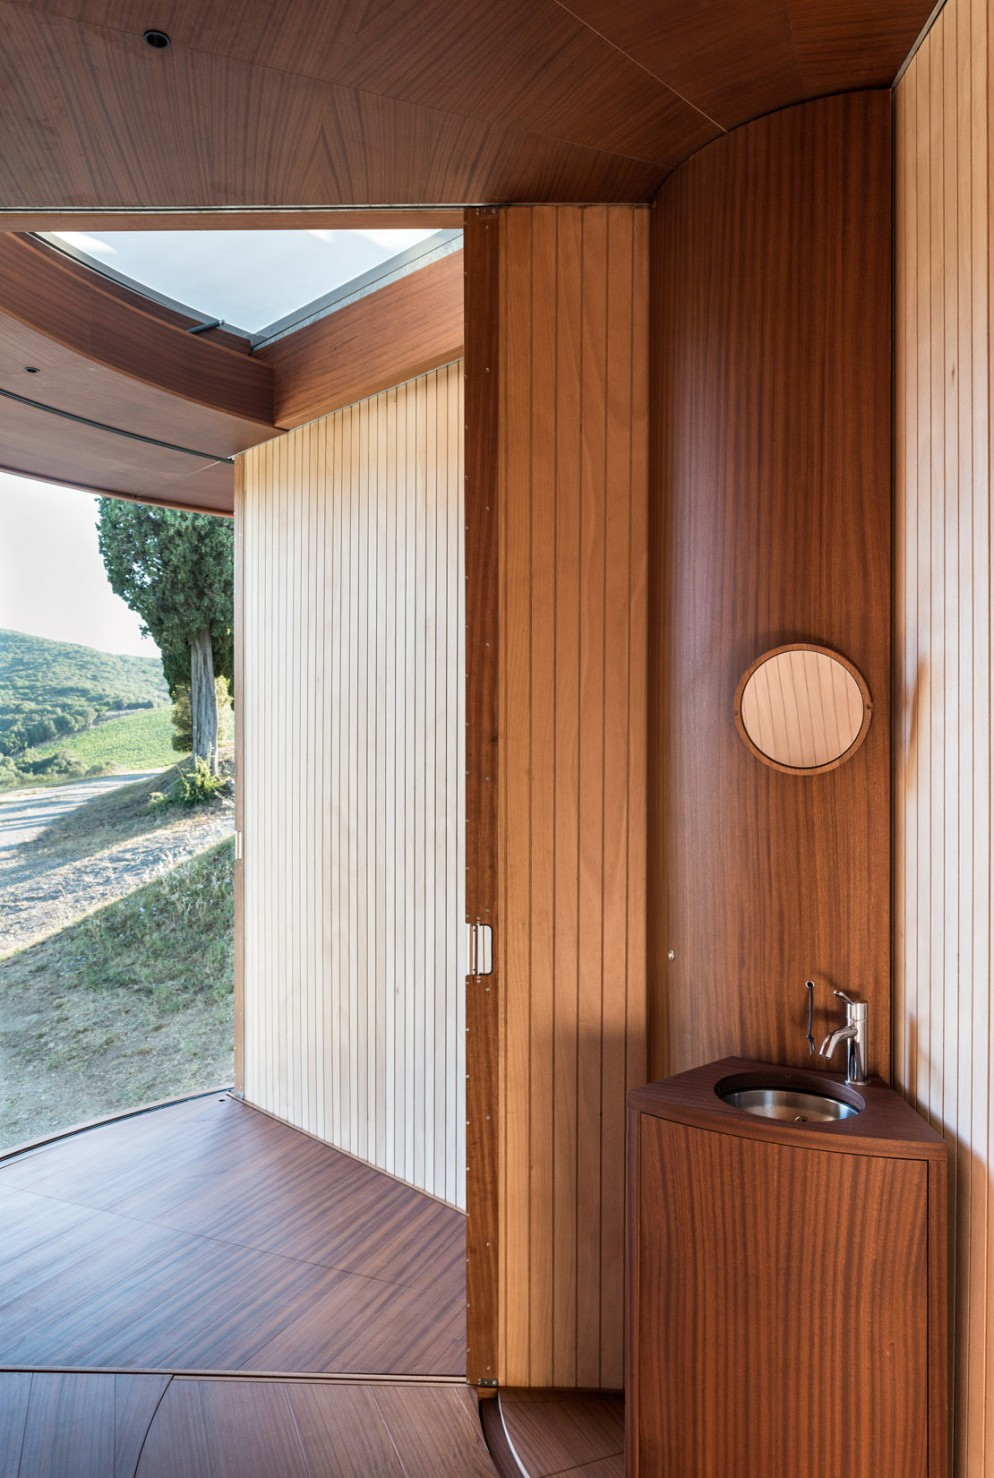 casa-ojalá-suite-nomade-architetto-beatrice-bonzanigo-09